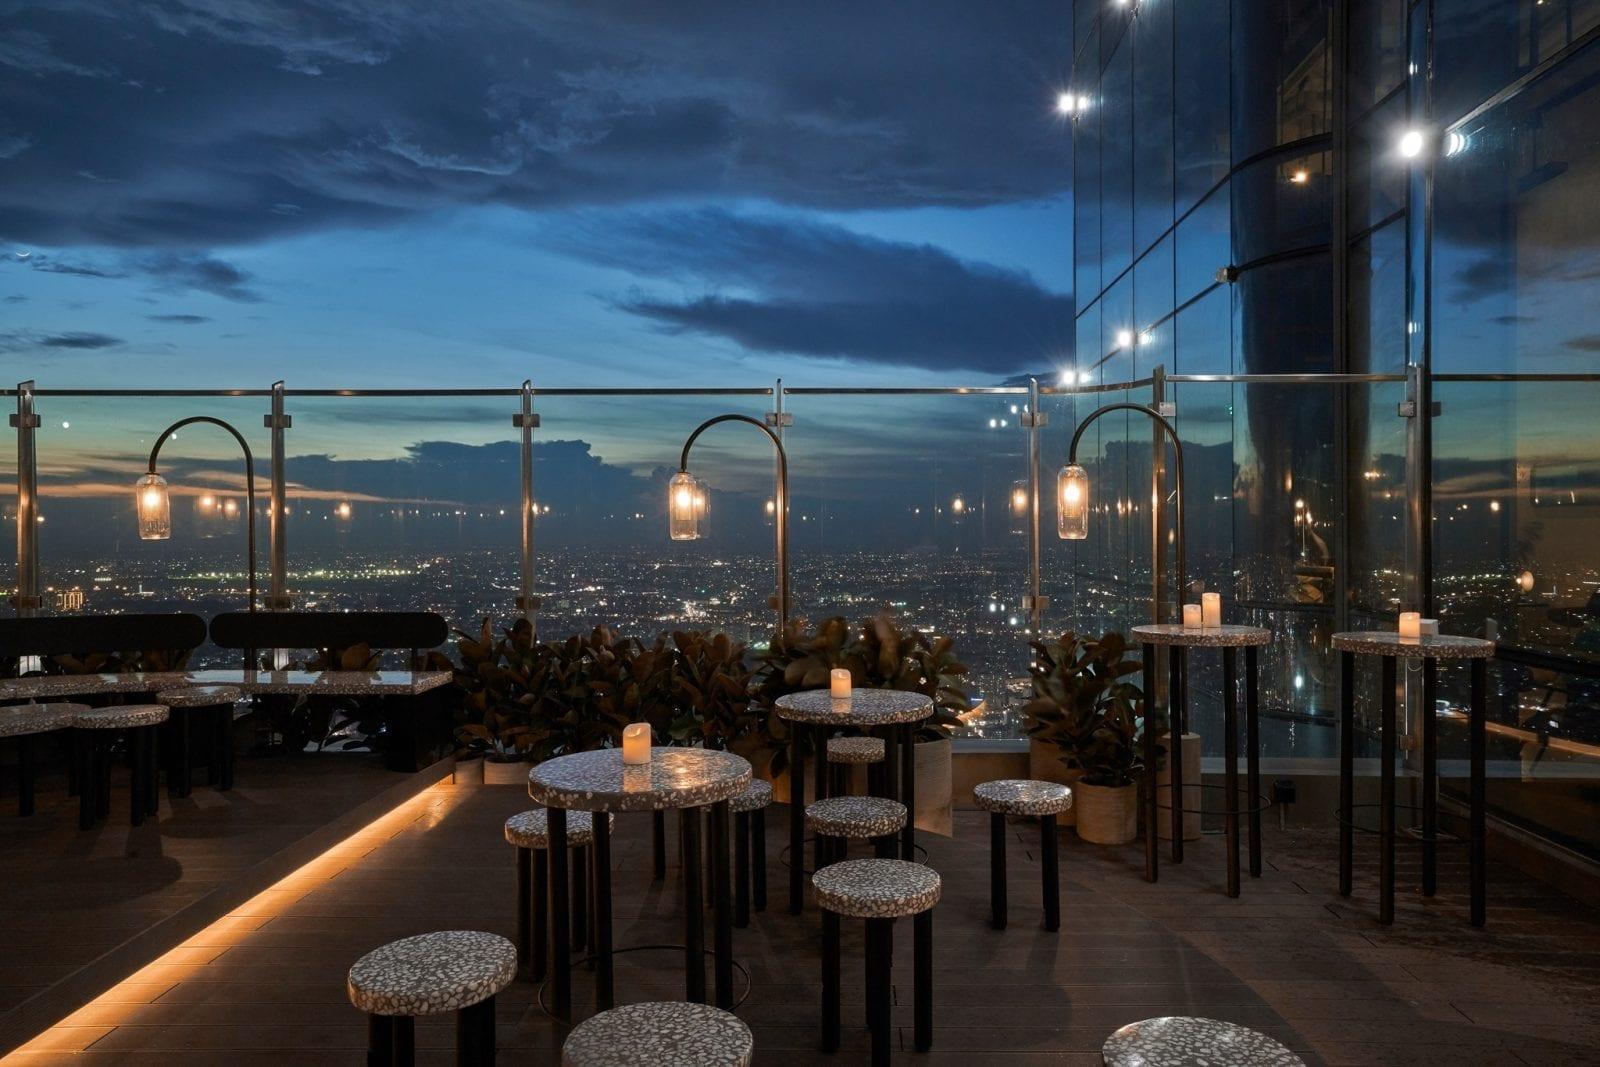 Image of outdoor seating at Blank Lounge in Landmark 81 in Vietnam